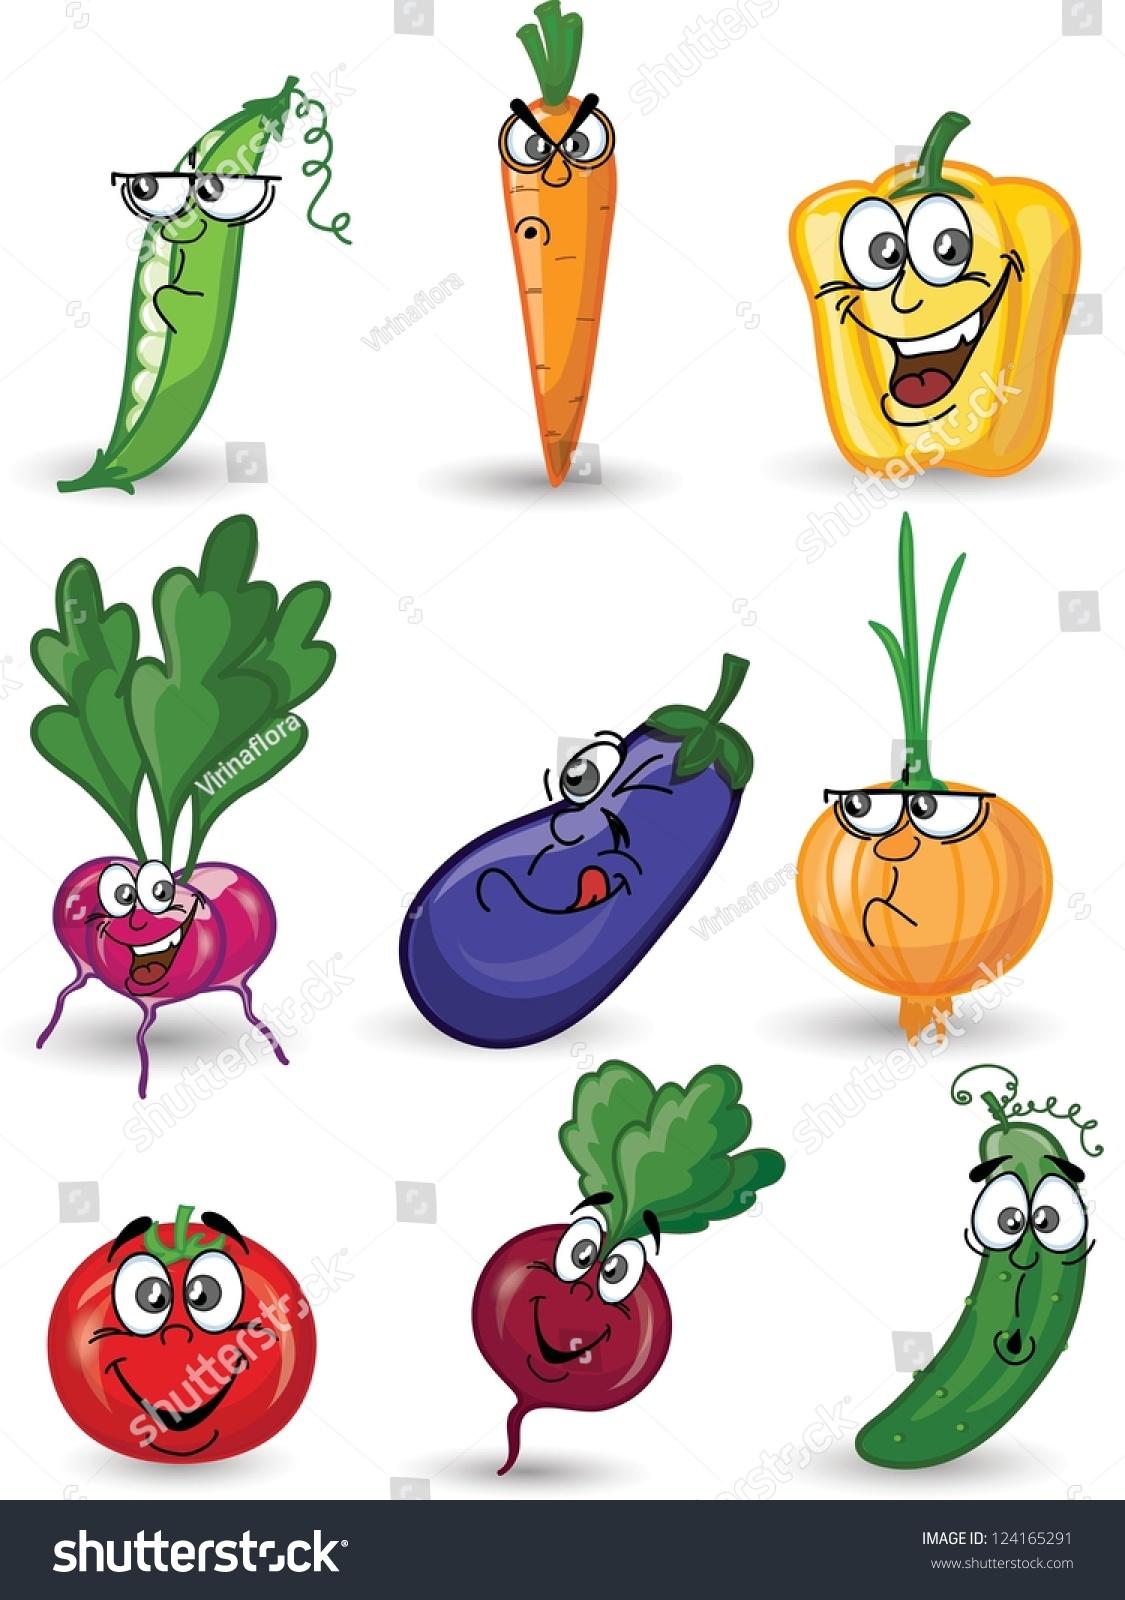 Cartoon Vegetables Faces Stock Vector 124165291 - Shutterstock